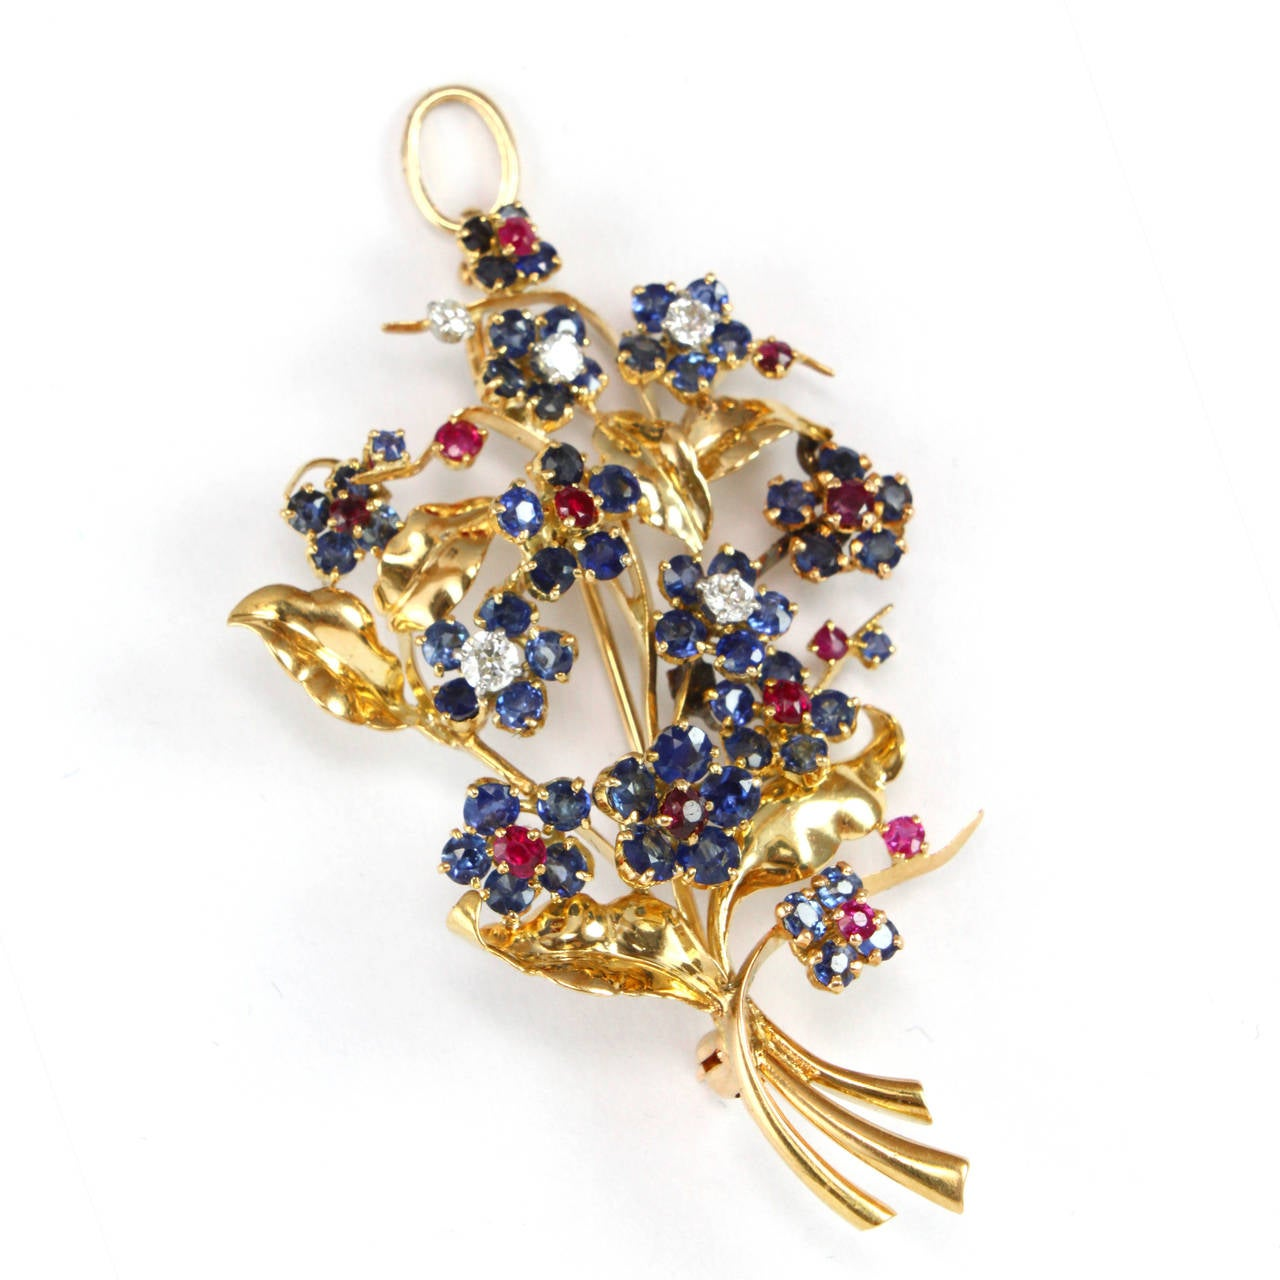 1948 Mauboussin Ruby Sapphire Diamond Flower Brooch or Pendant 5